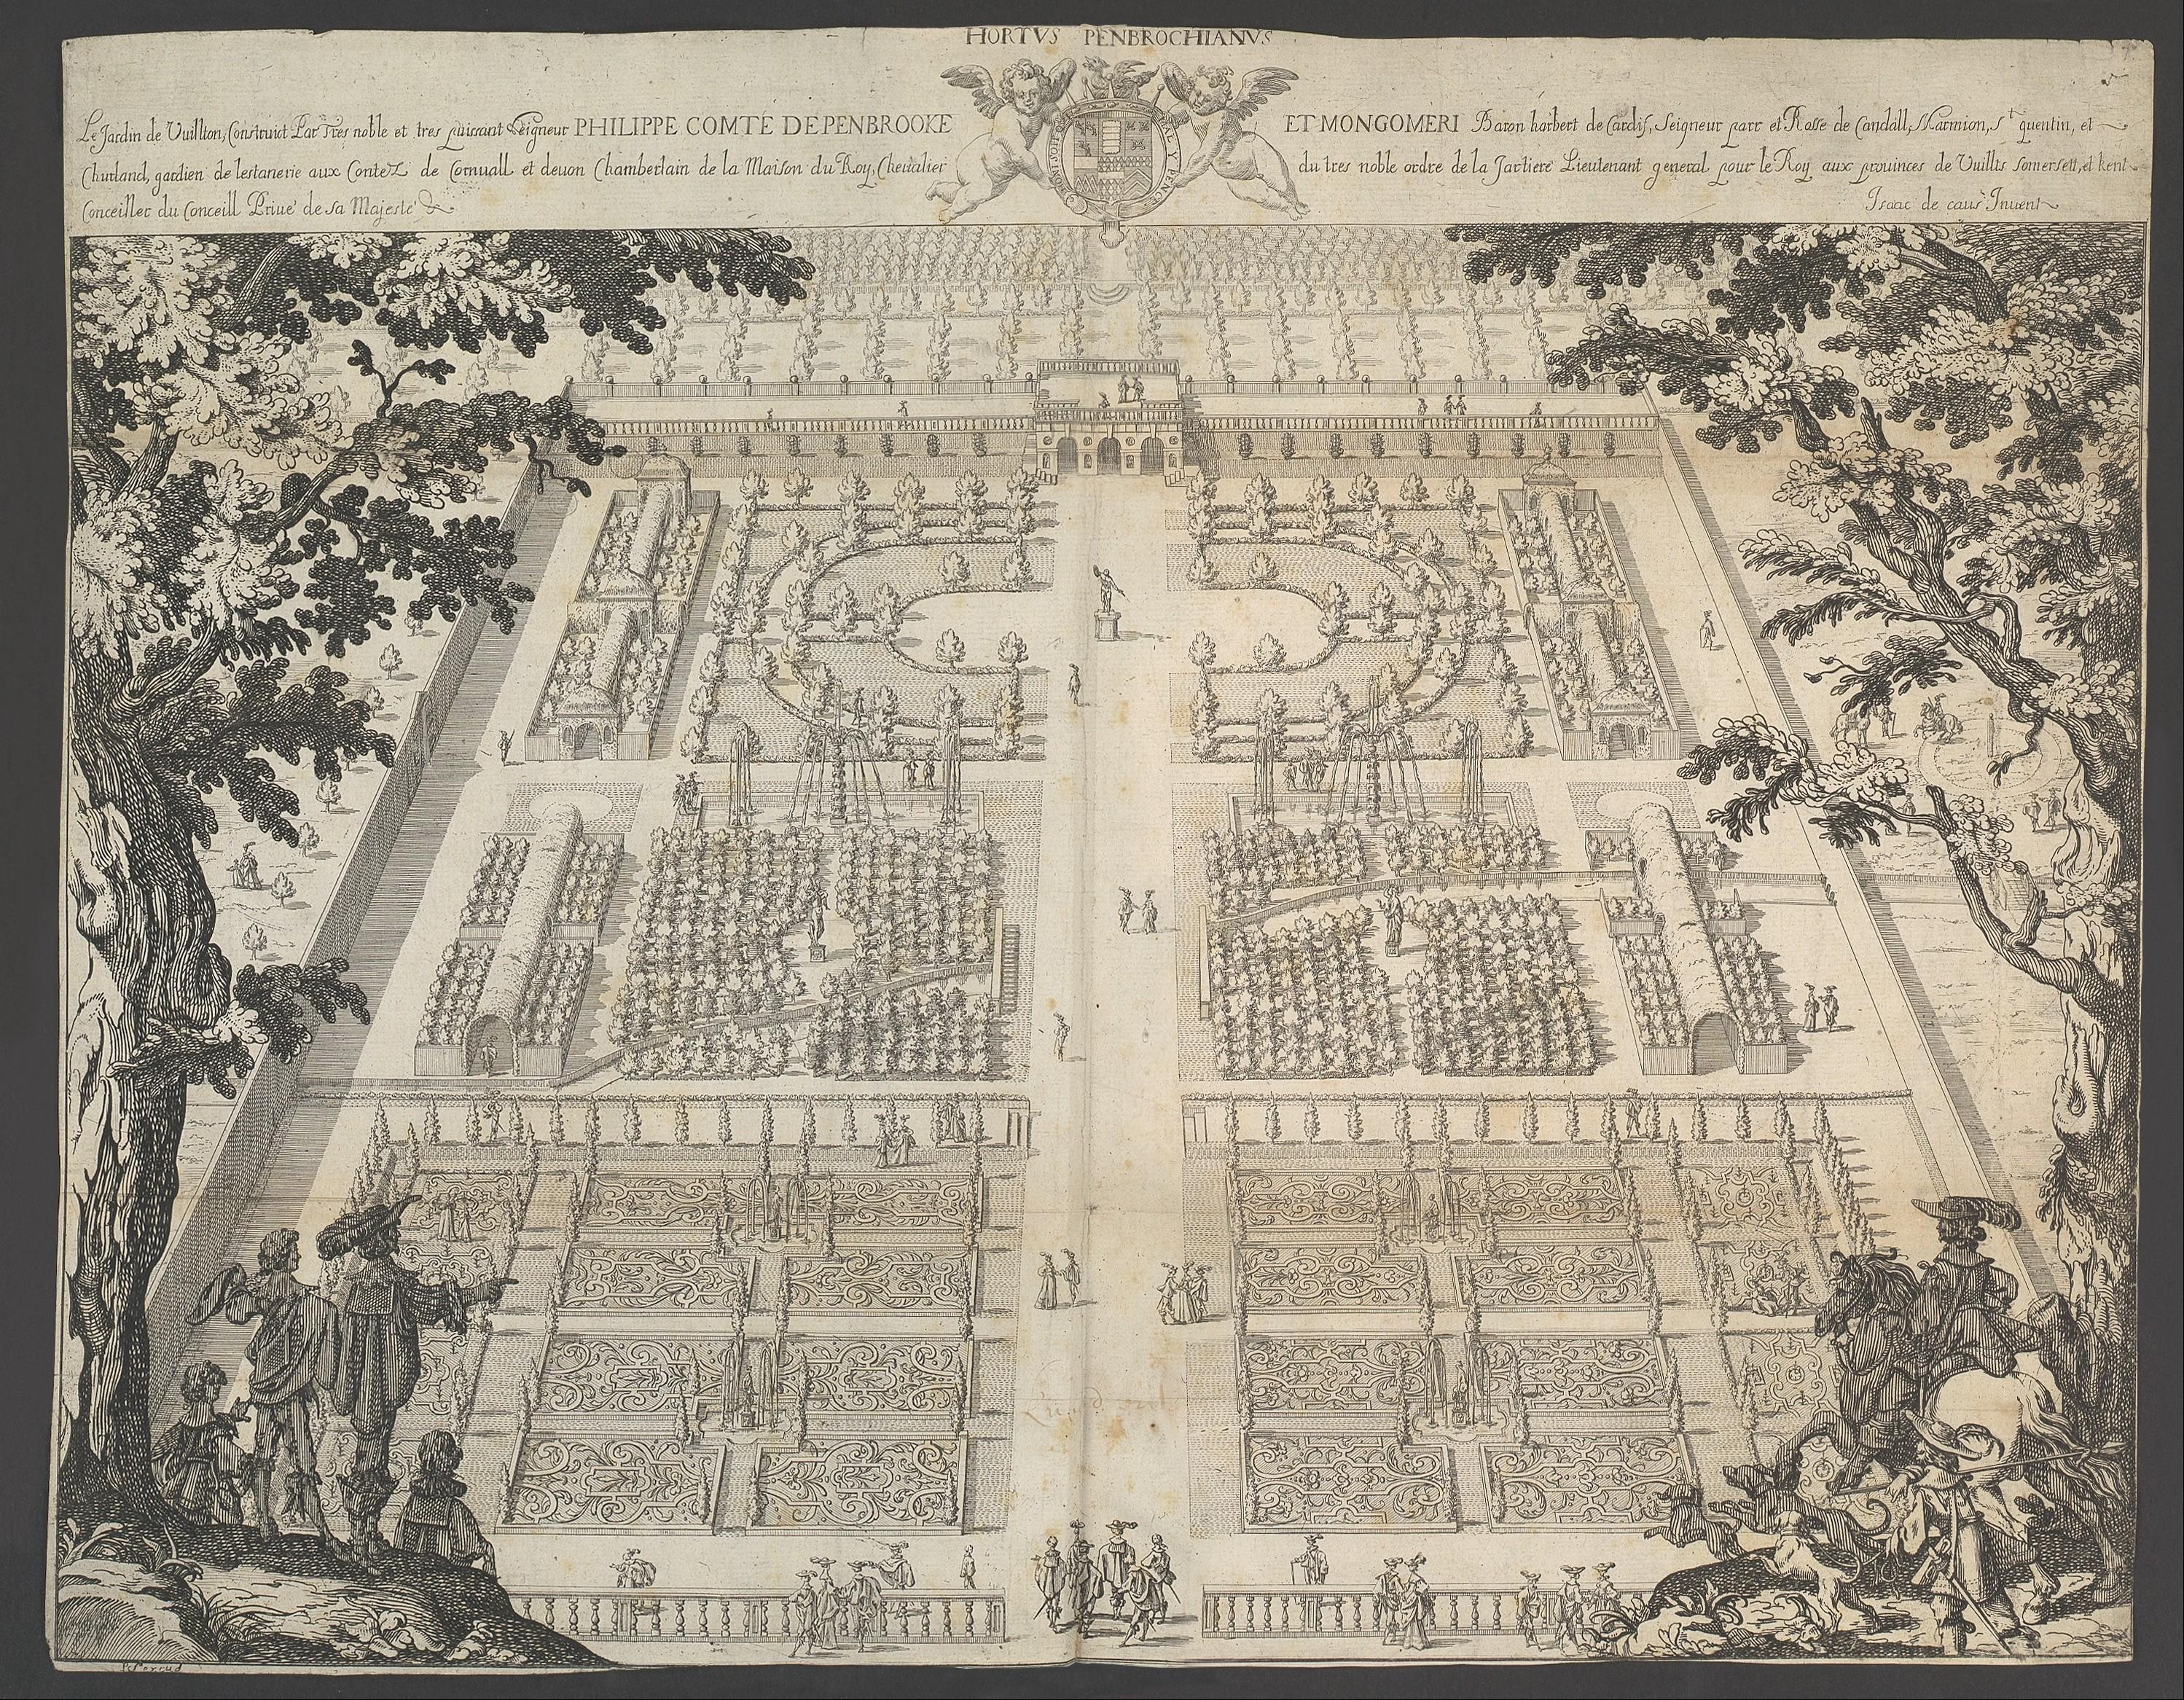 Isaac De Caus Wilton Garden The Metropolitan Museum Of Art